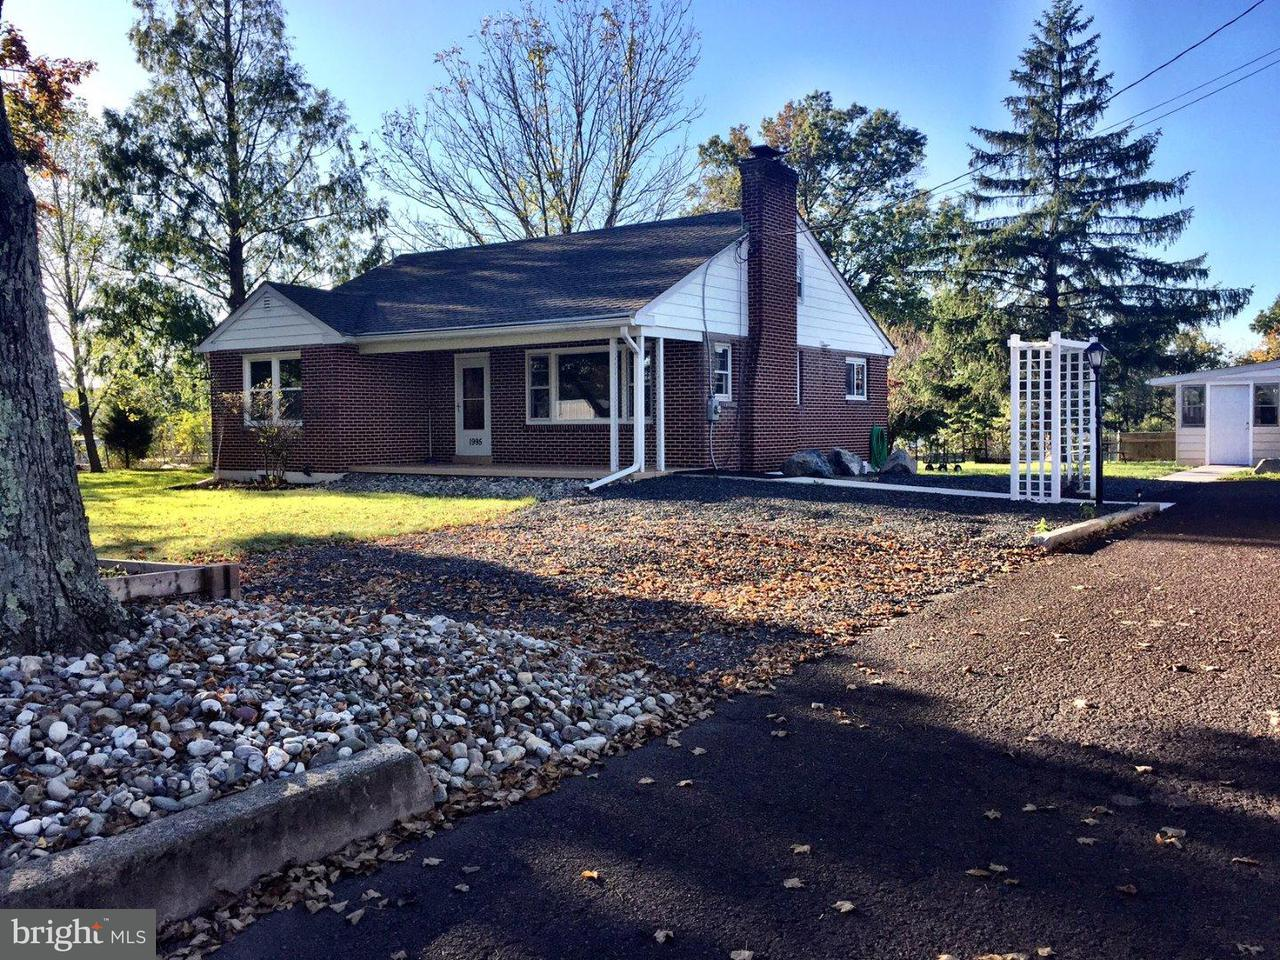 Single Family Home for Sale at 1995 E CHERRY Lane Souderton, Pennsylvania 18964 United States